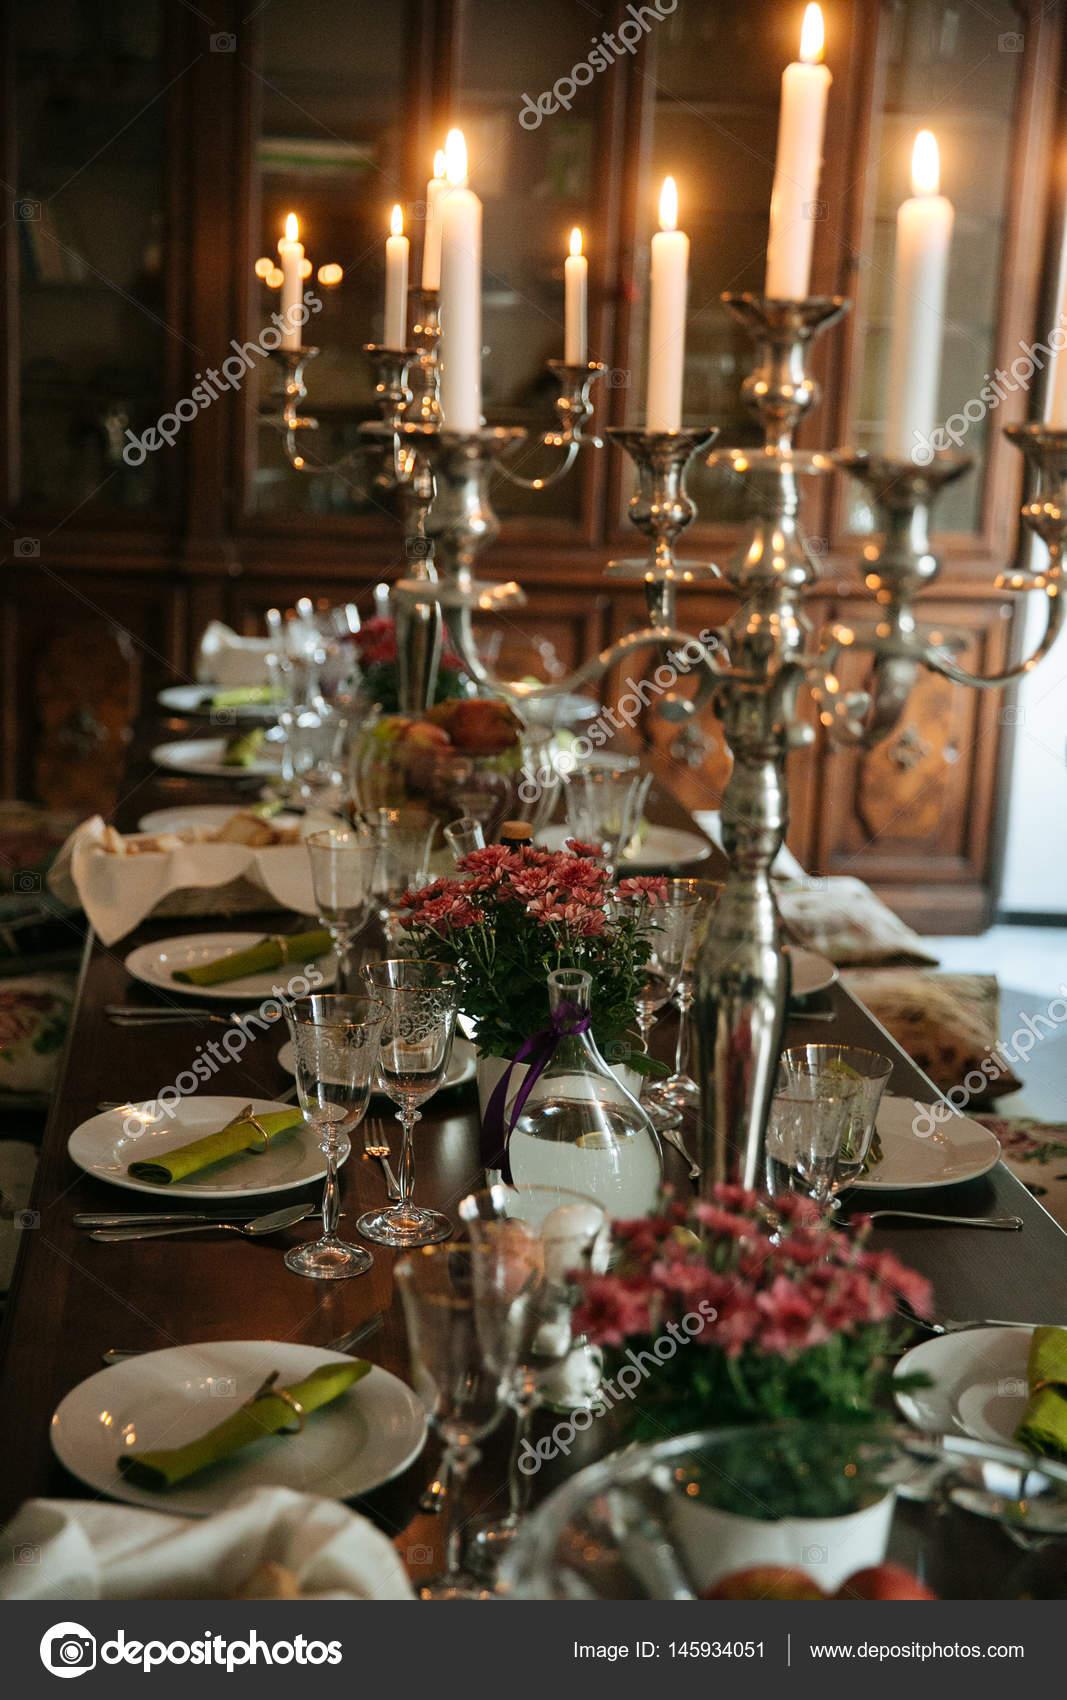 Elegant banquet table setting u2014 Stock Photo & Elegant banquet table setting u2014 Stock Photo © peterkarasev #145934051